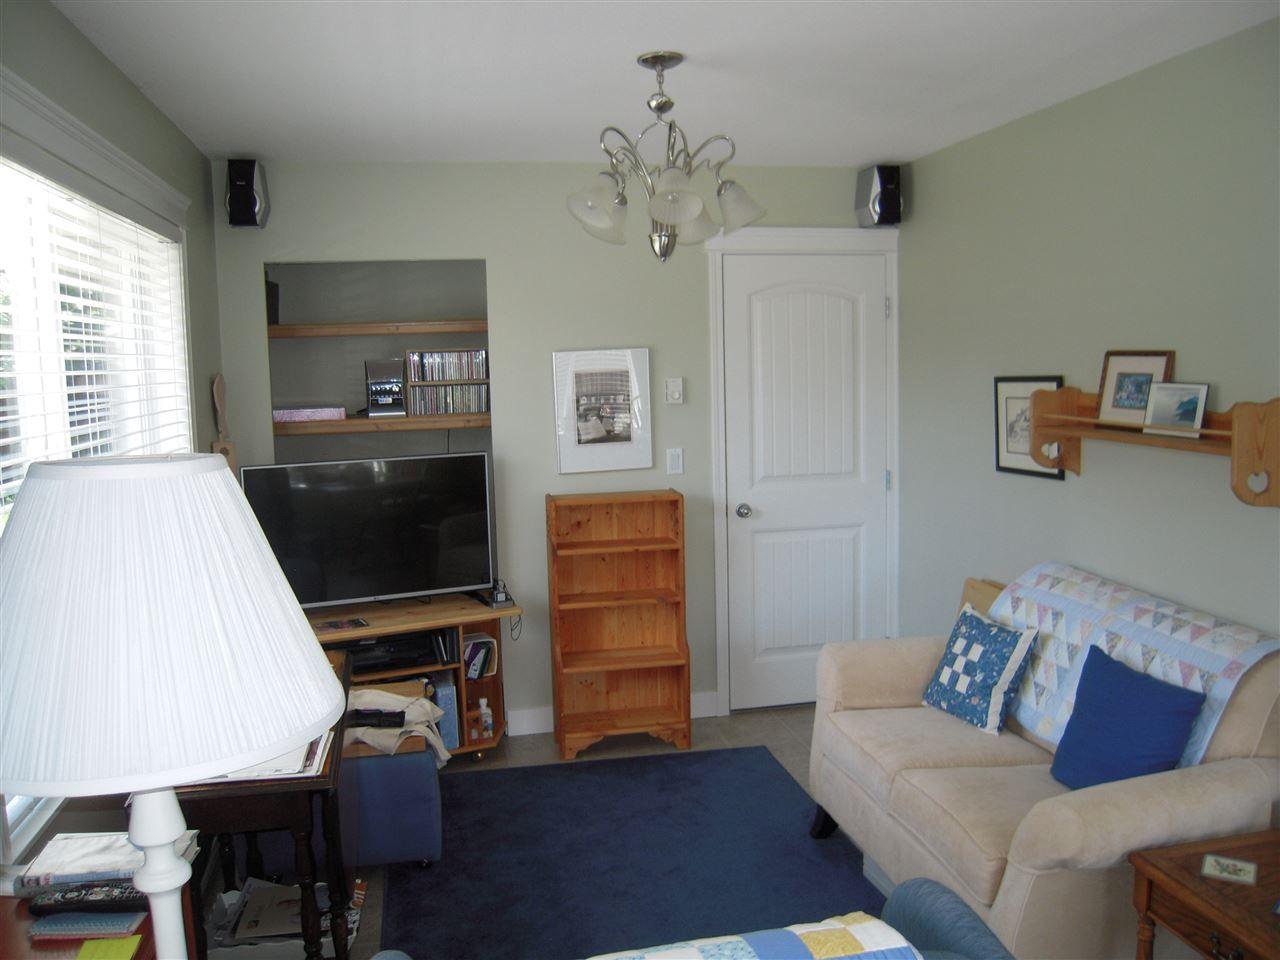 Photo 8: Photos: 5735 EMILY Way in Sechelt: Sechelt District House for sale (Sunshine Coast)  : MLS®# R2179124